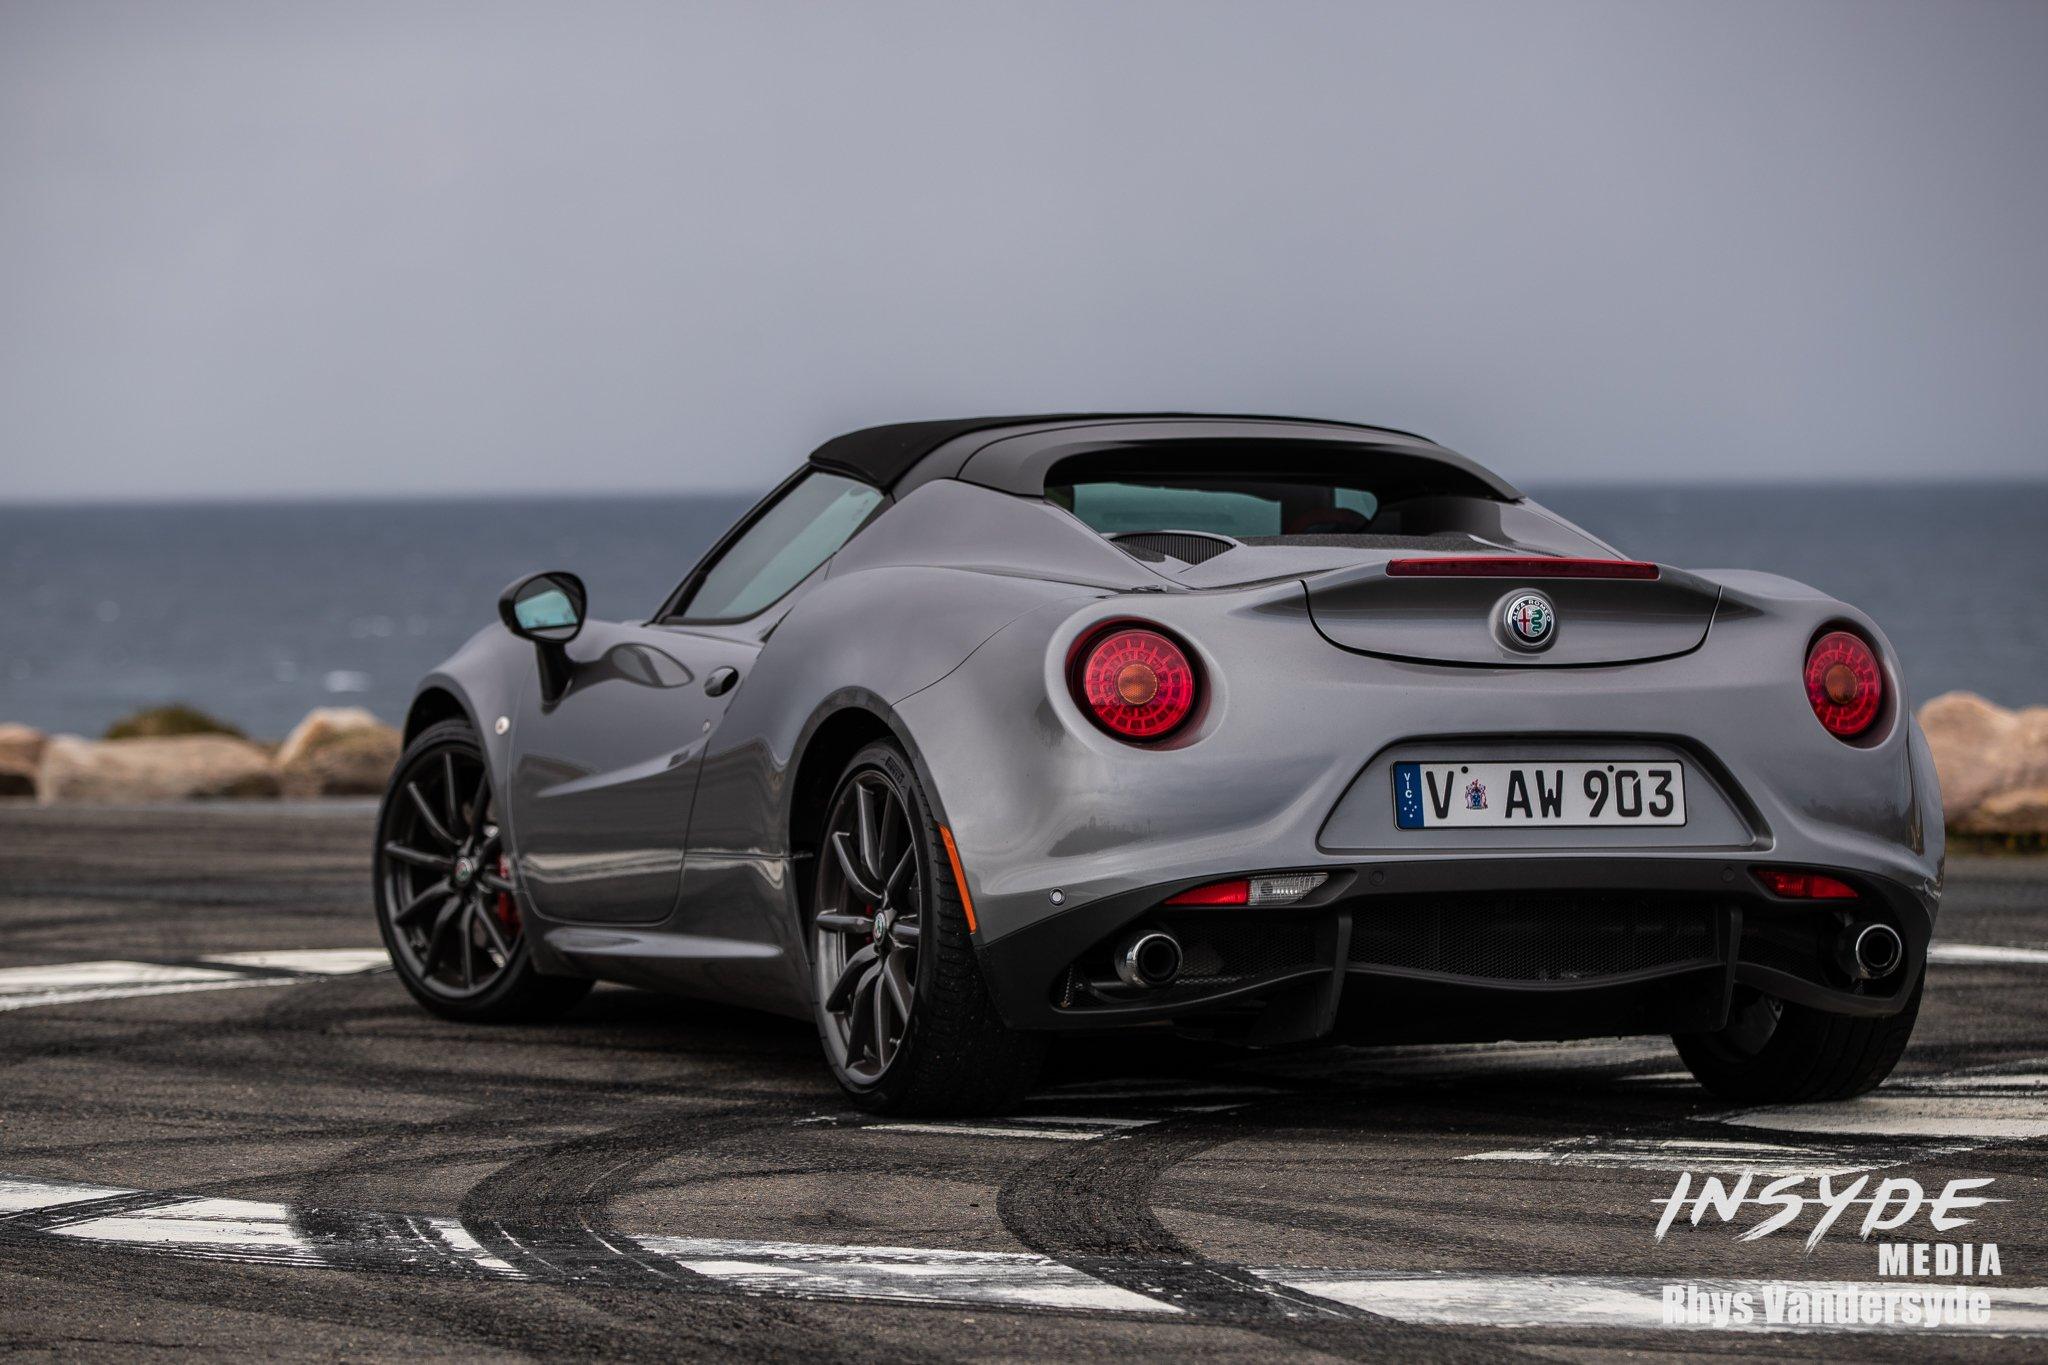 Photo Shoot: Alfa Romeo 4C